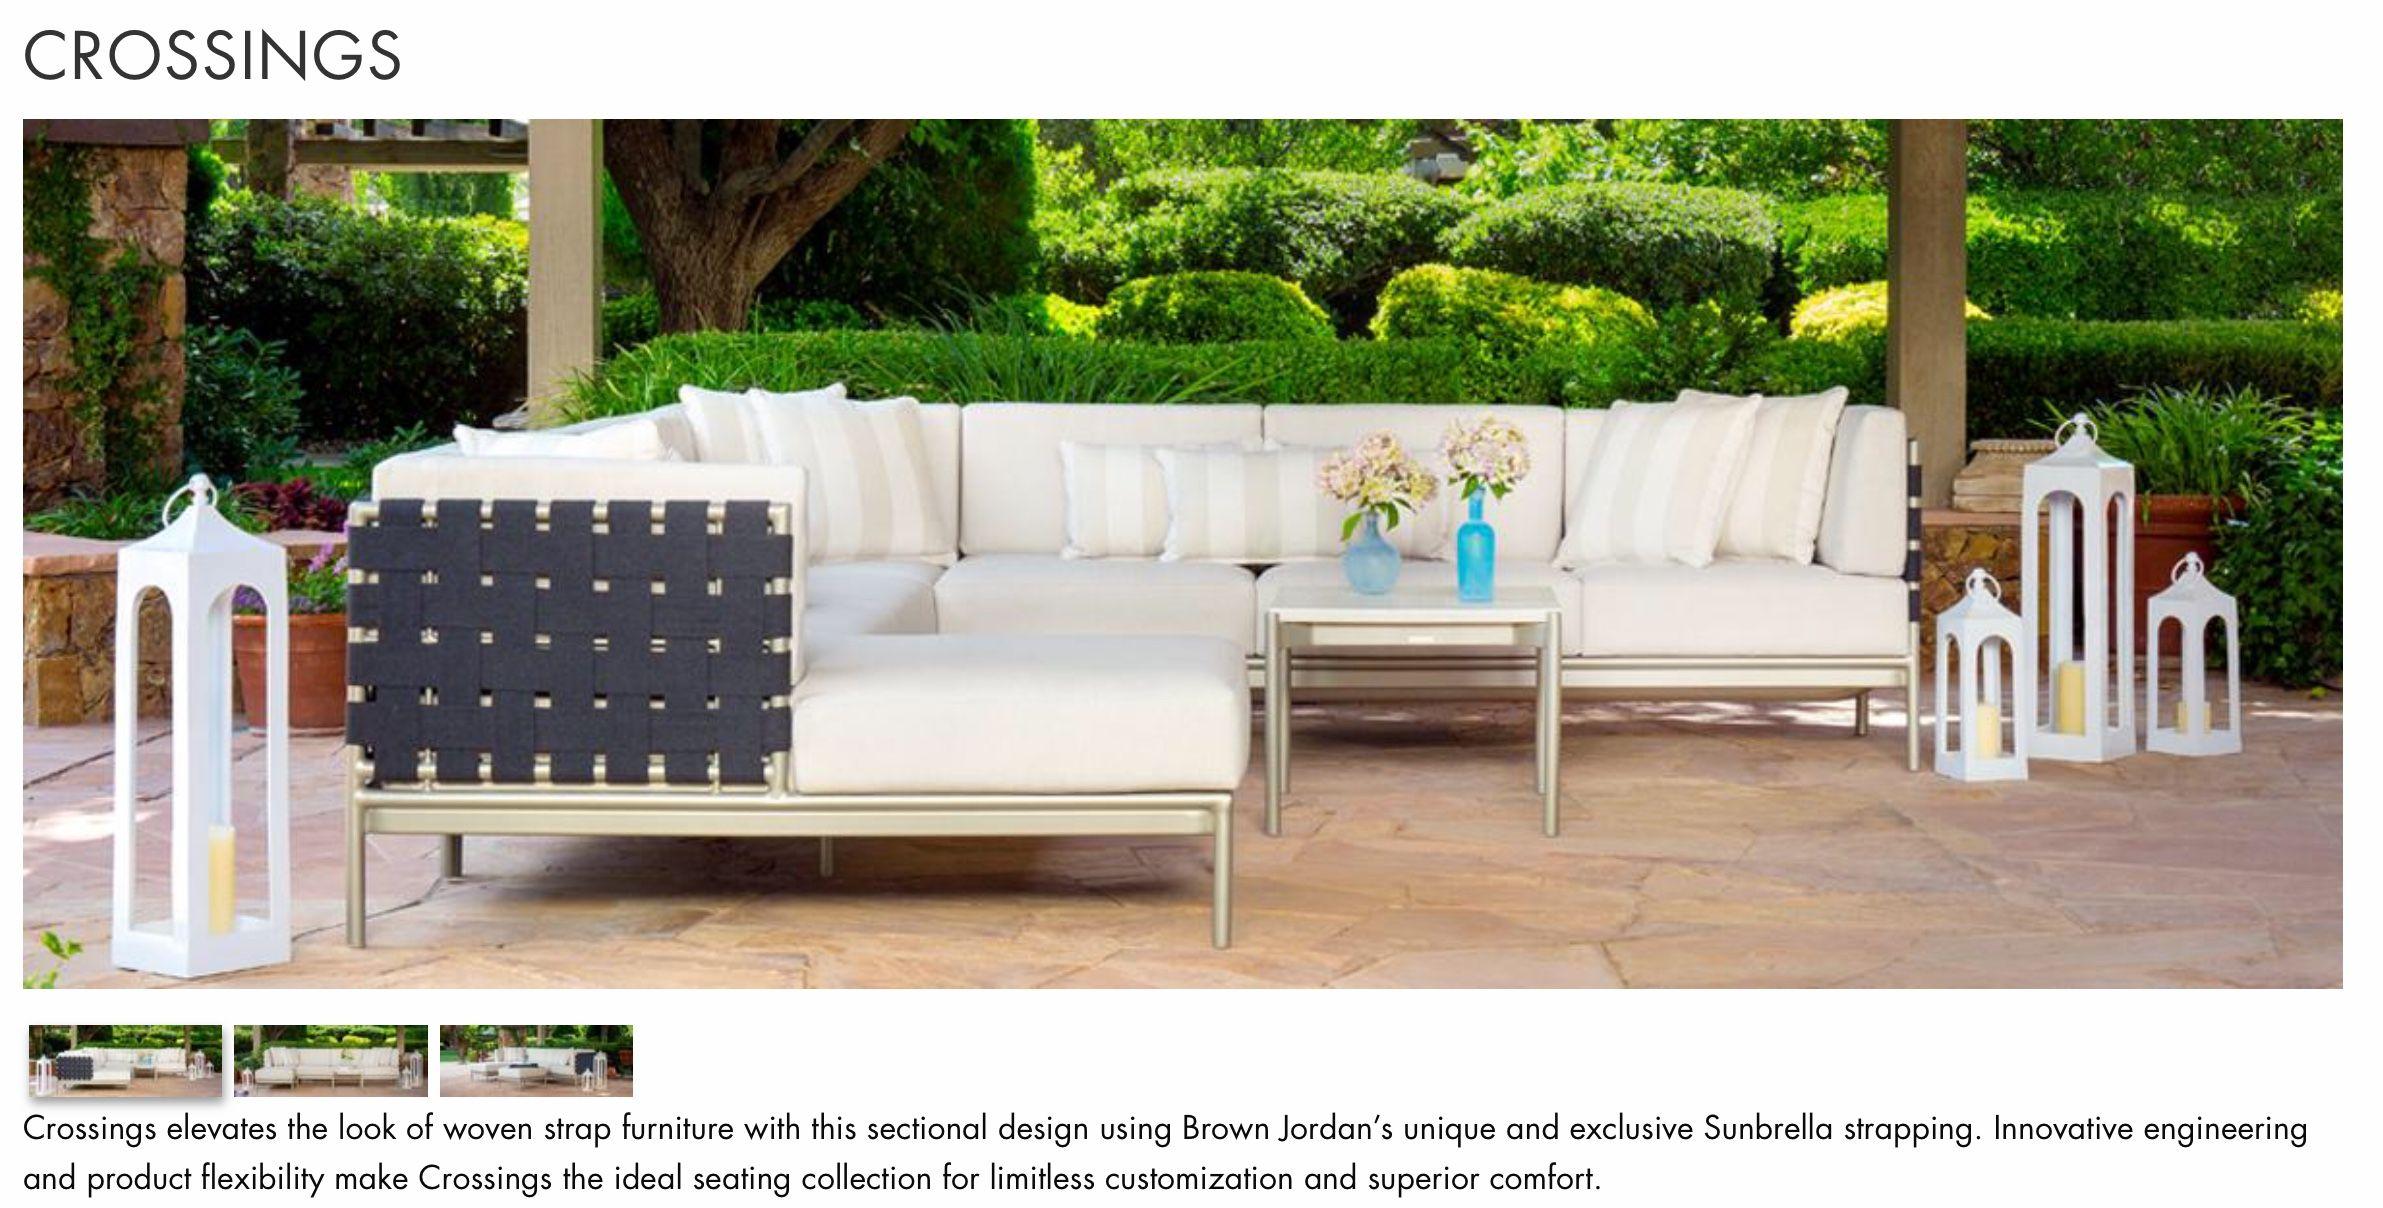 Crossing Sectional Deep Seating Brown Jordan Outdoor Sofa Furniture Sets Jordans